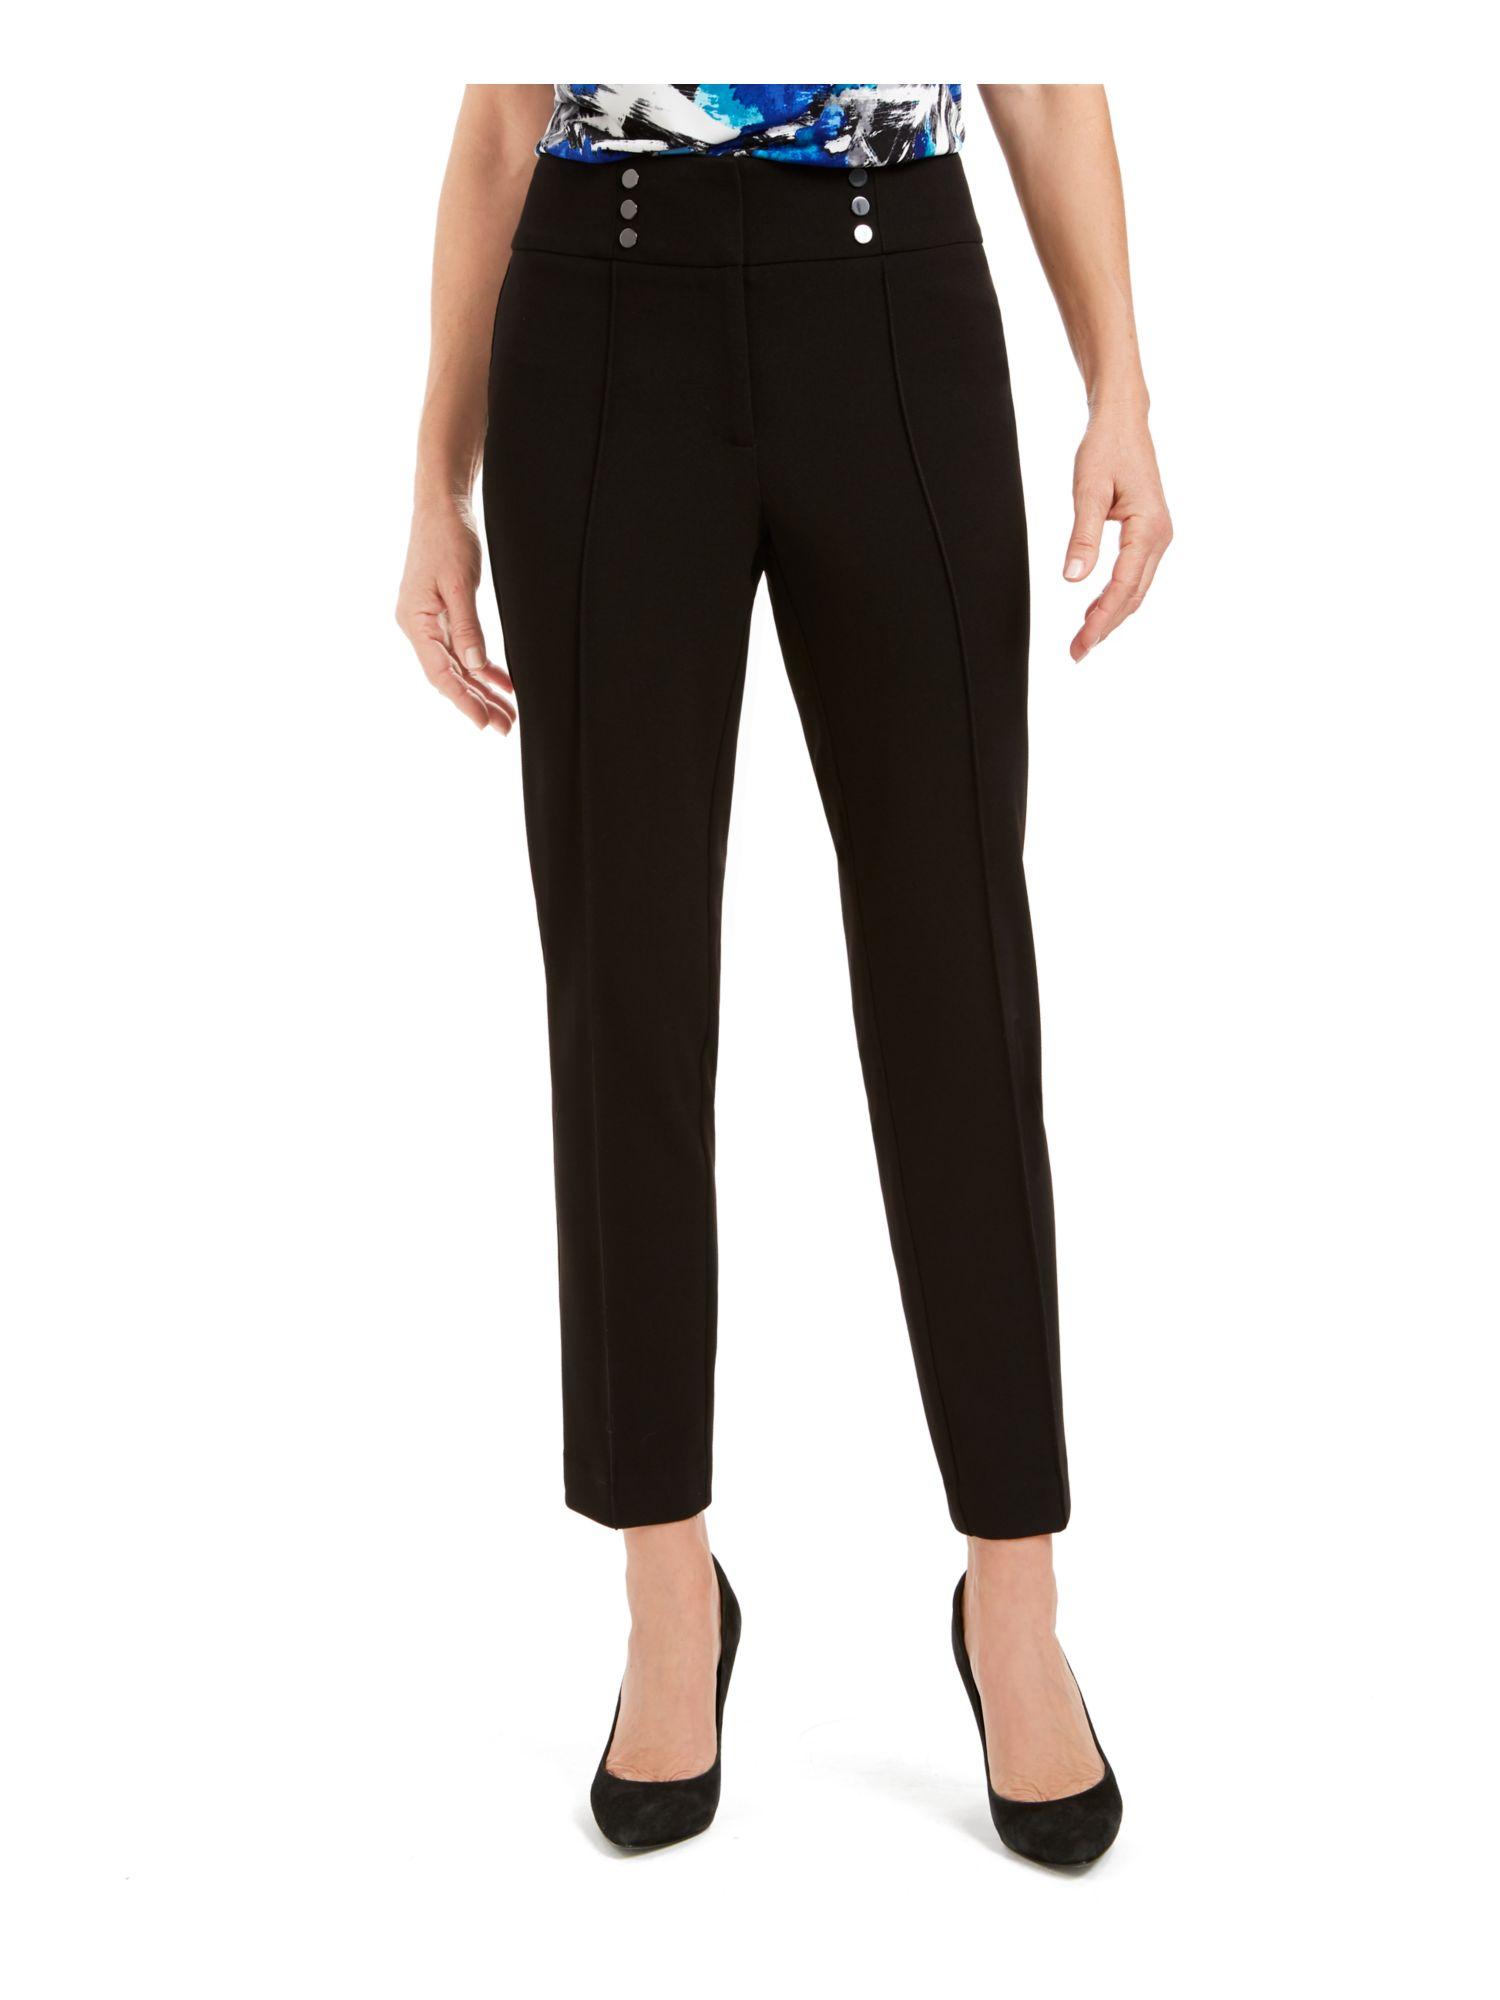 Pick AMERICAN EAGLE Women/'s Pants Work Business Dress School Uniform Prep AERO